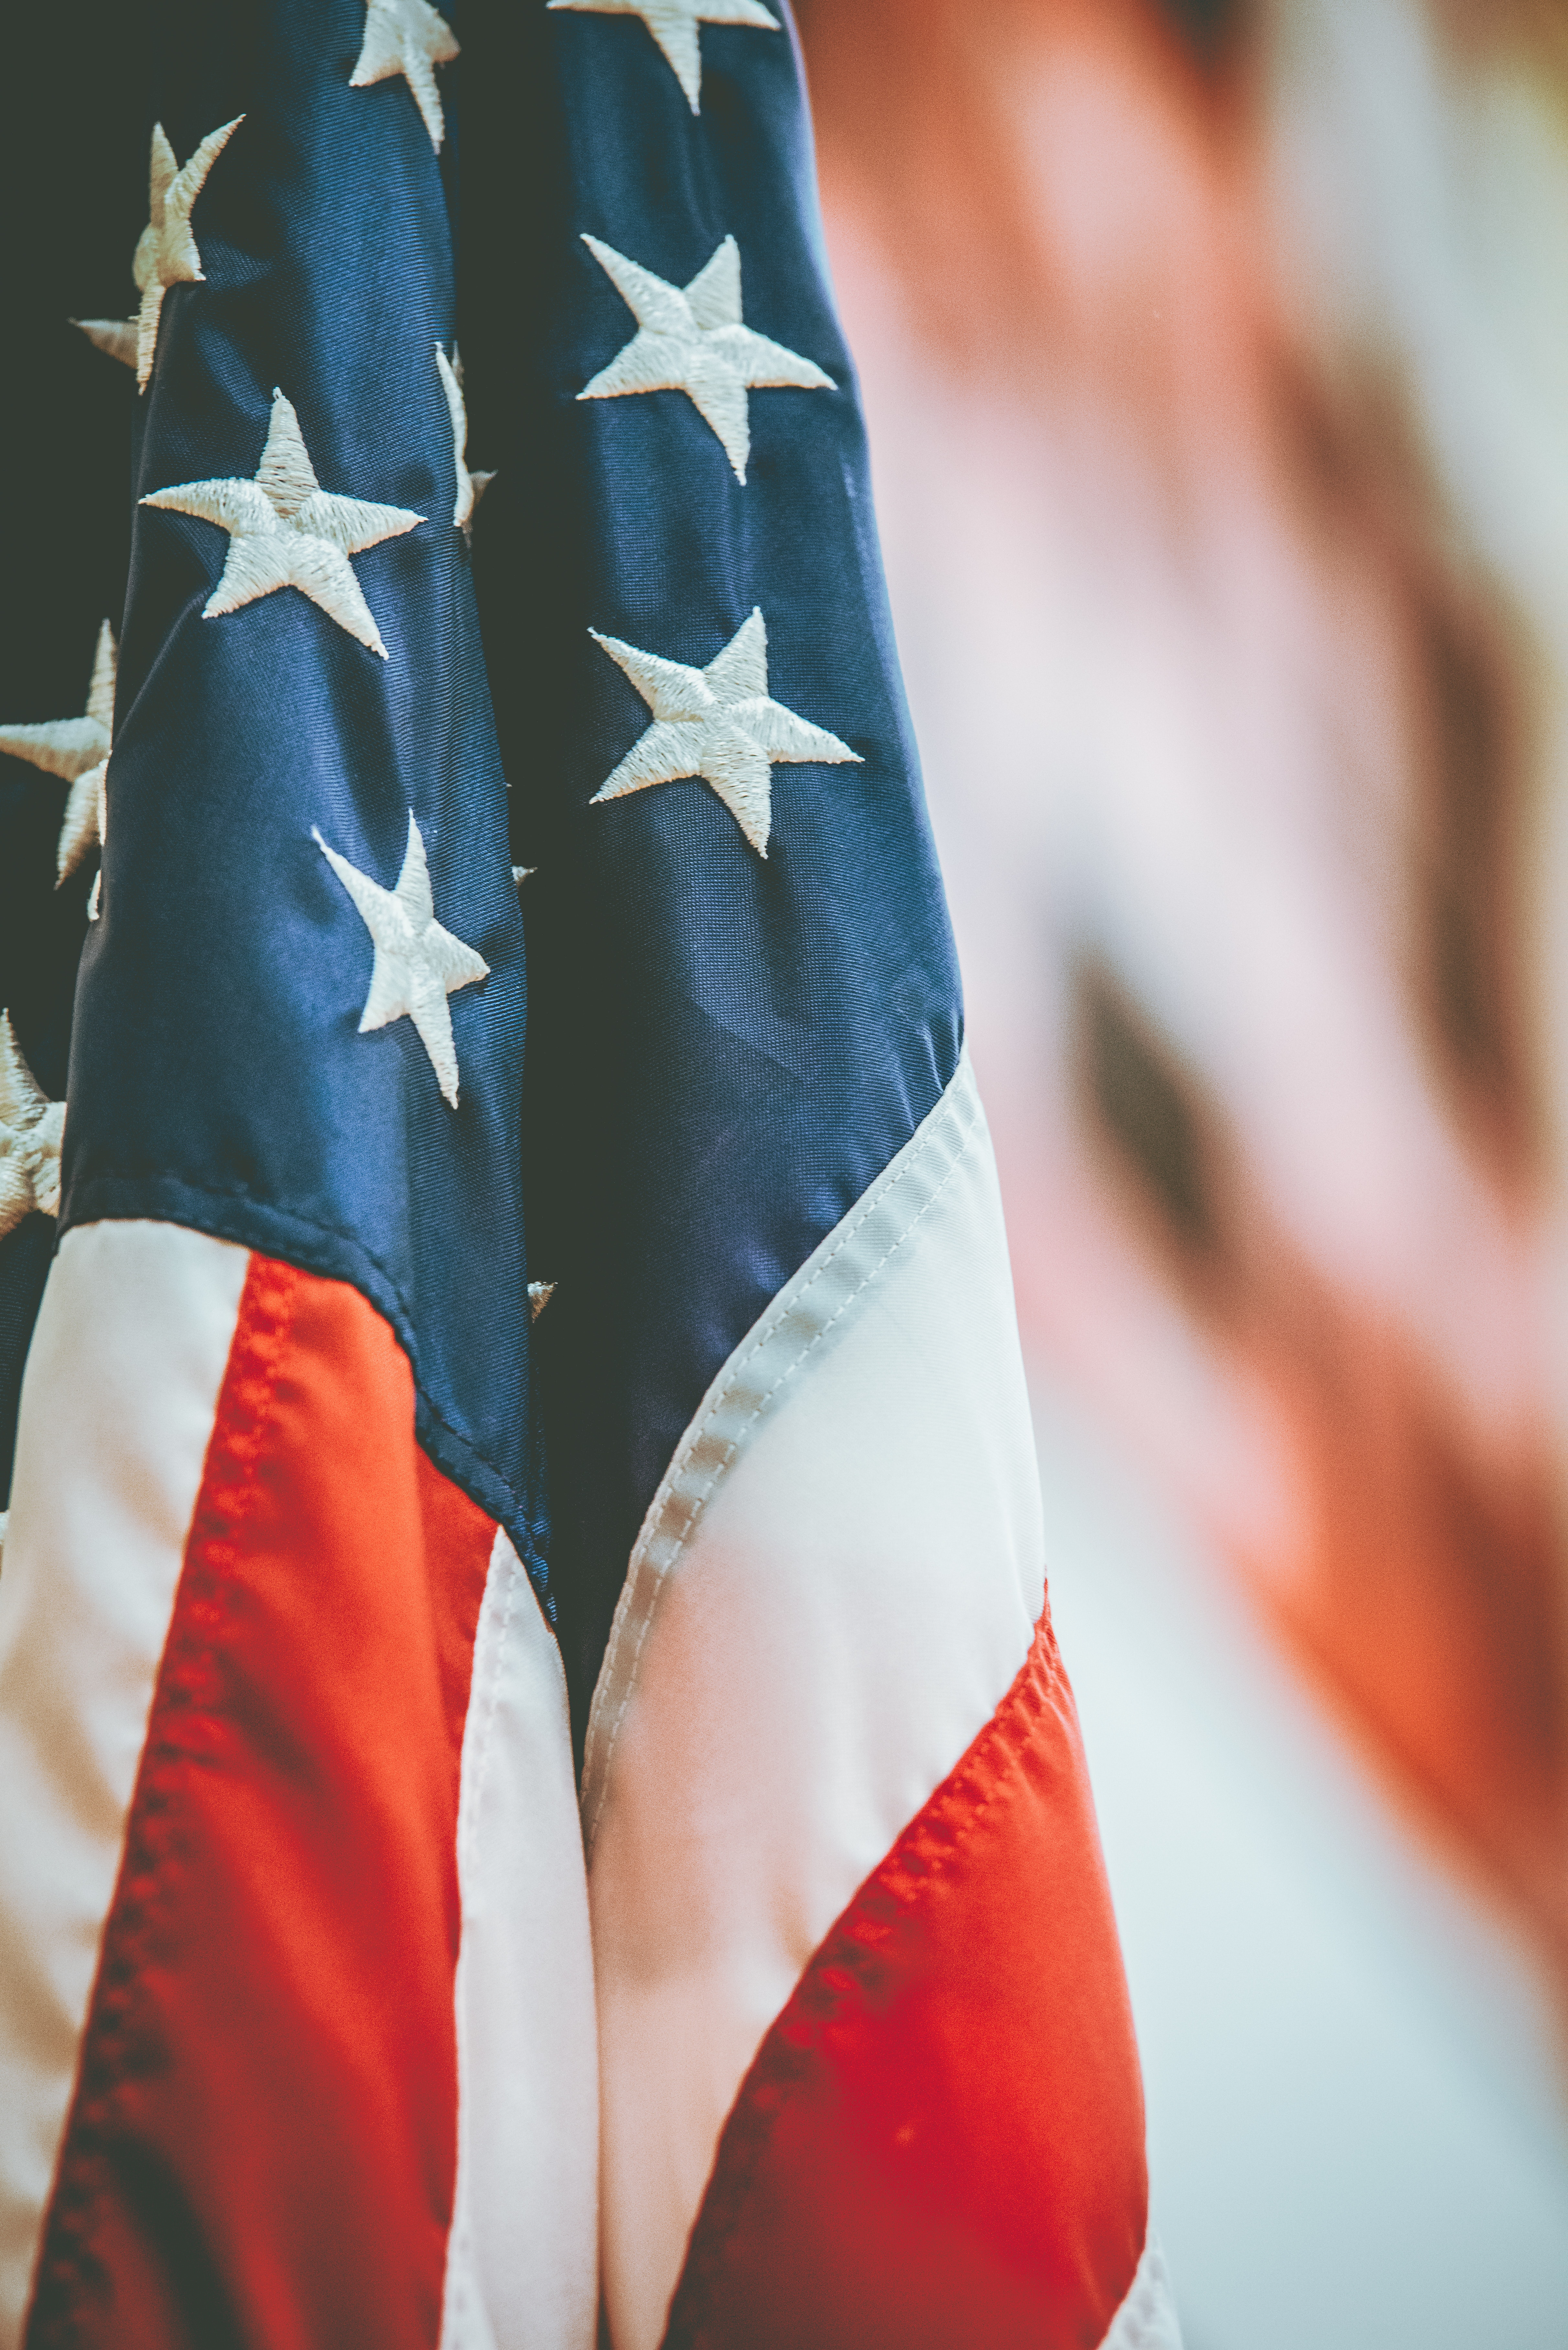 administration-america-american-flag-1590766.jpg